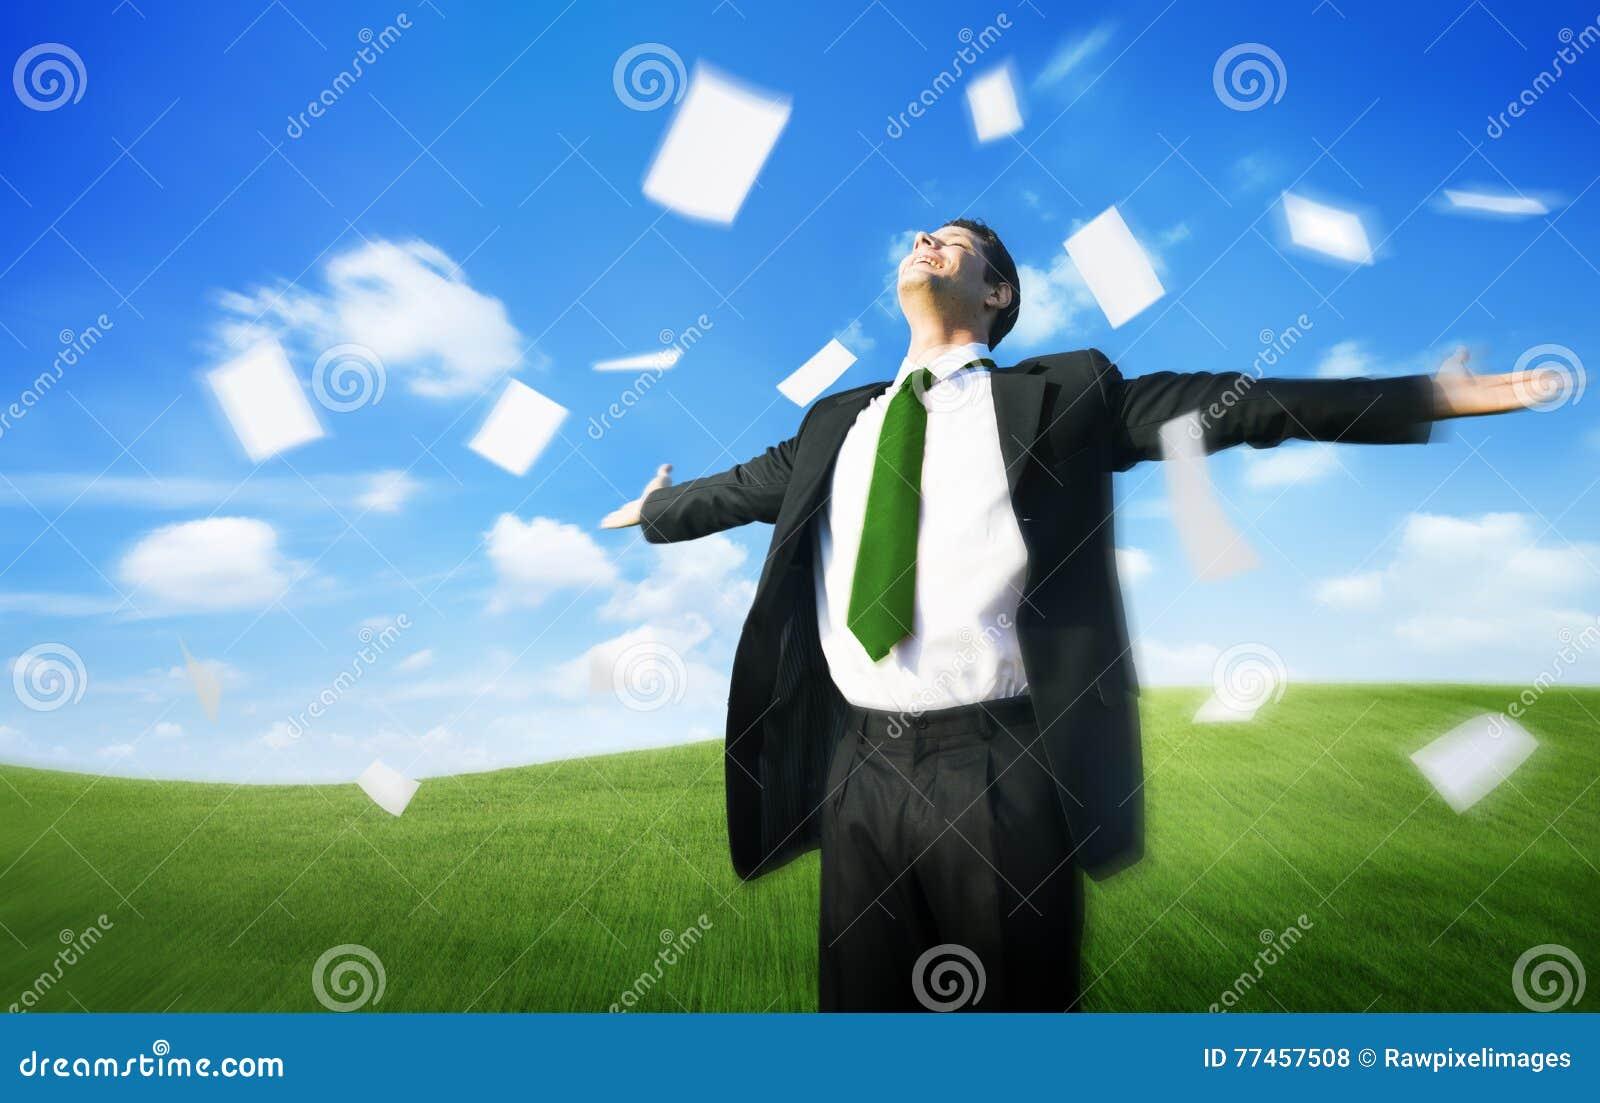 Geschäfts-Geschäftsmann-Documents Throwing Happiness-Konzept